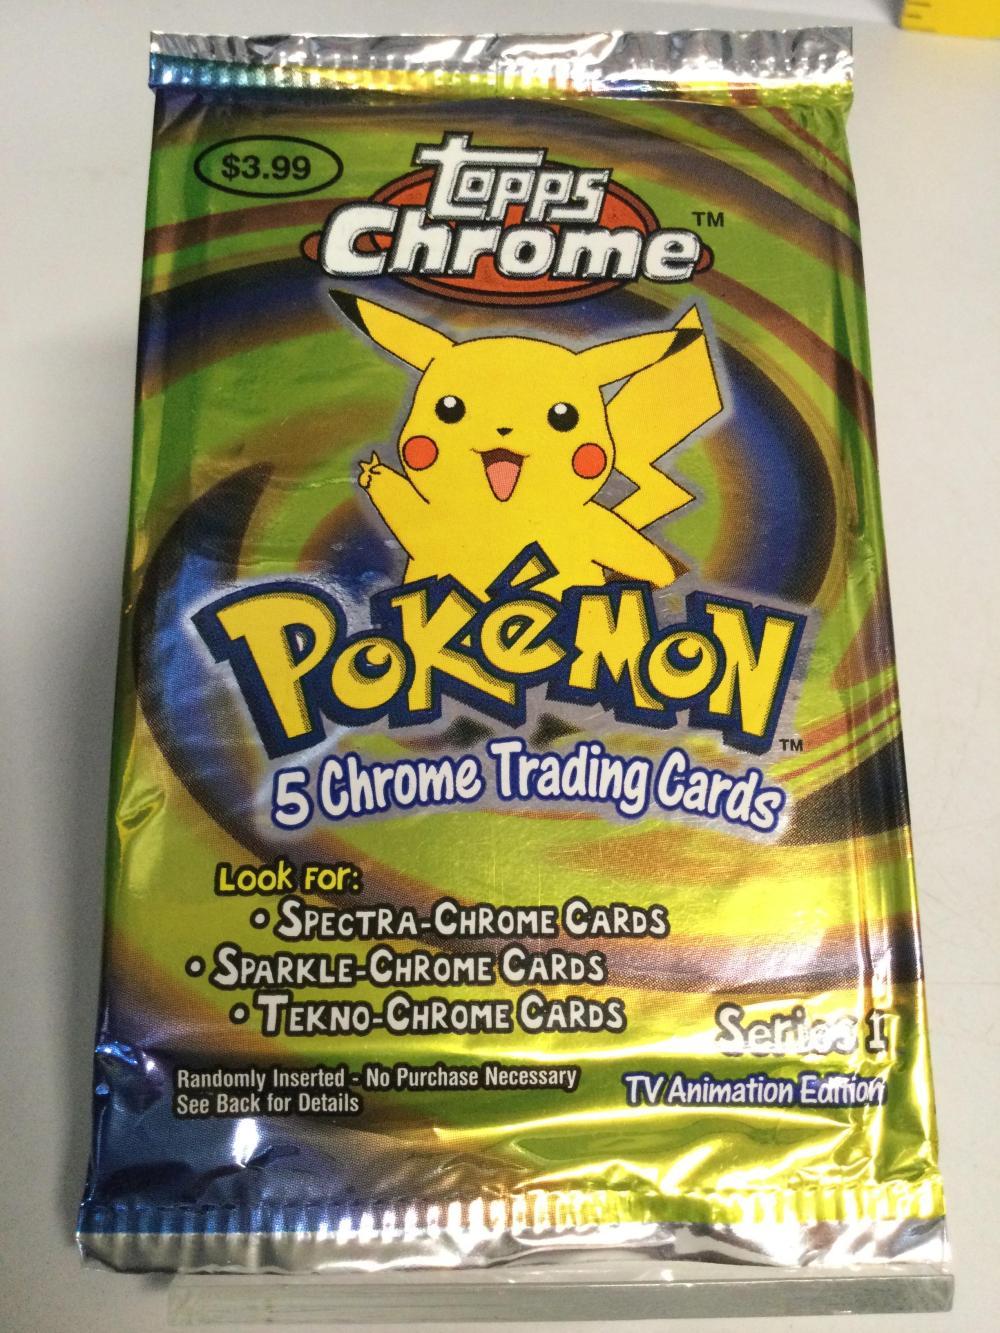 Pokémon Topps Chrome Trading Cards Pikachu